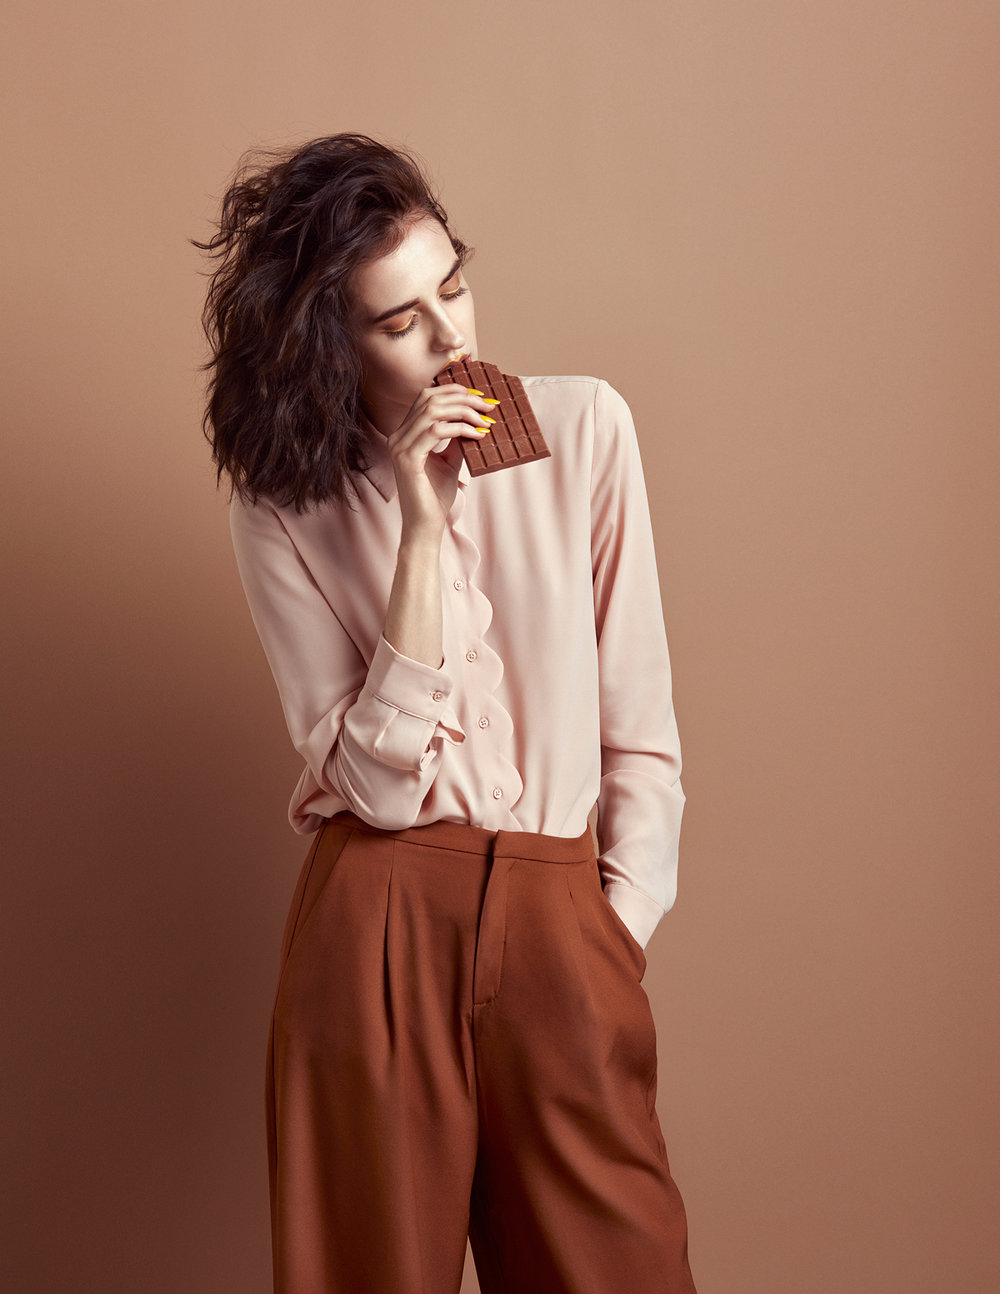 Emilie+Tournevache+Fashion+Photographer+Montreal.jpg